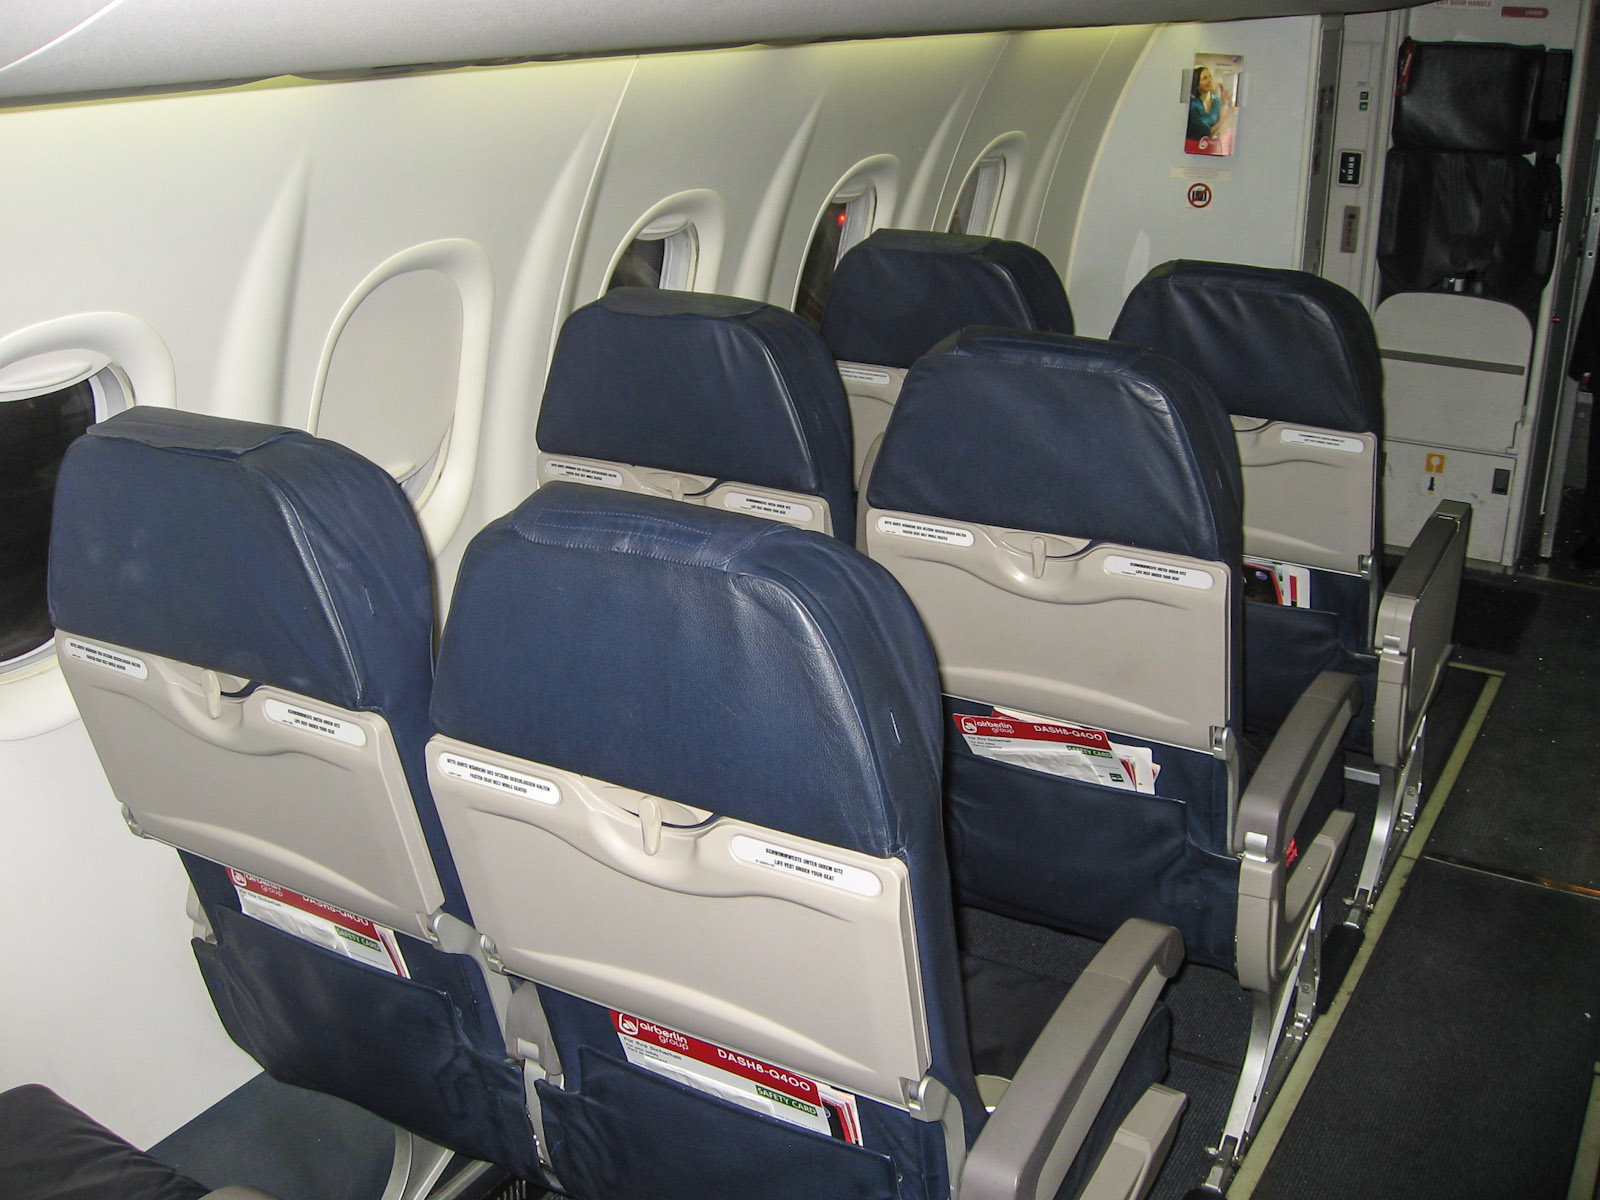 Салон самолета Bombardier Dash 8Q-400 авиакомпании LGW/airberlin